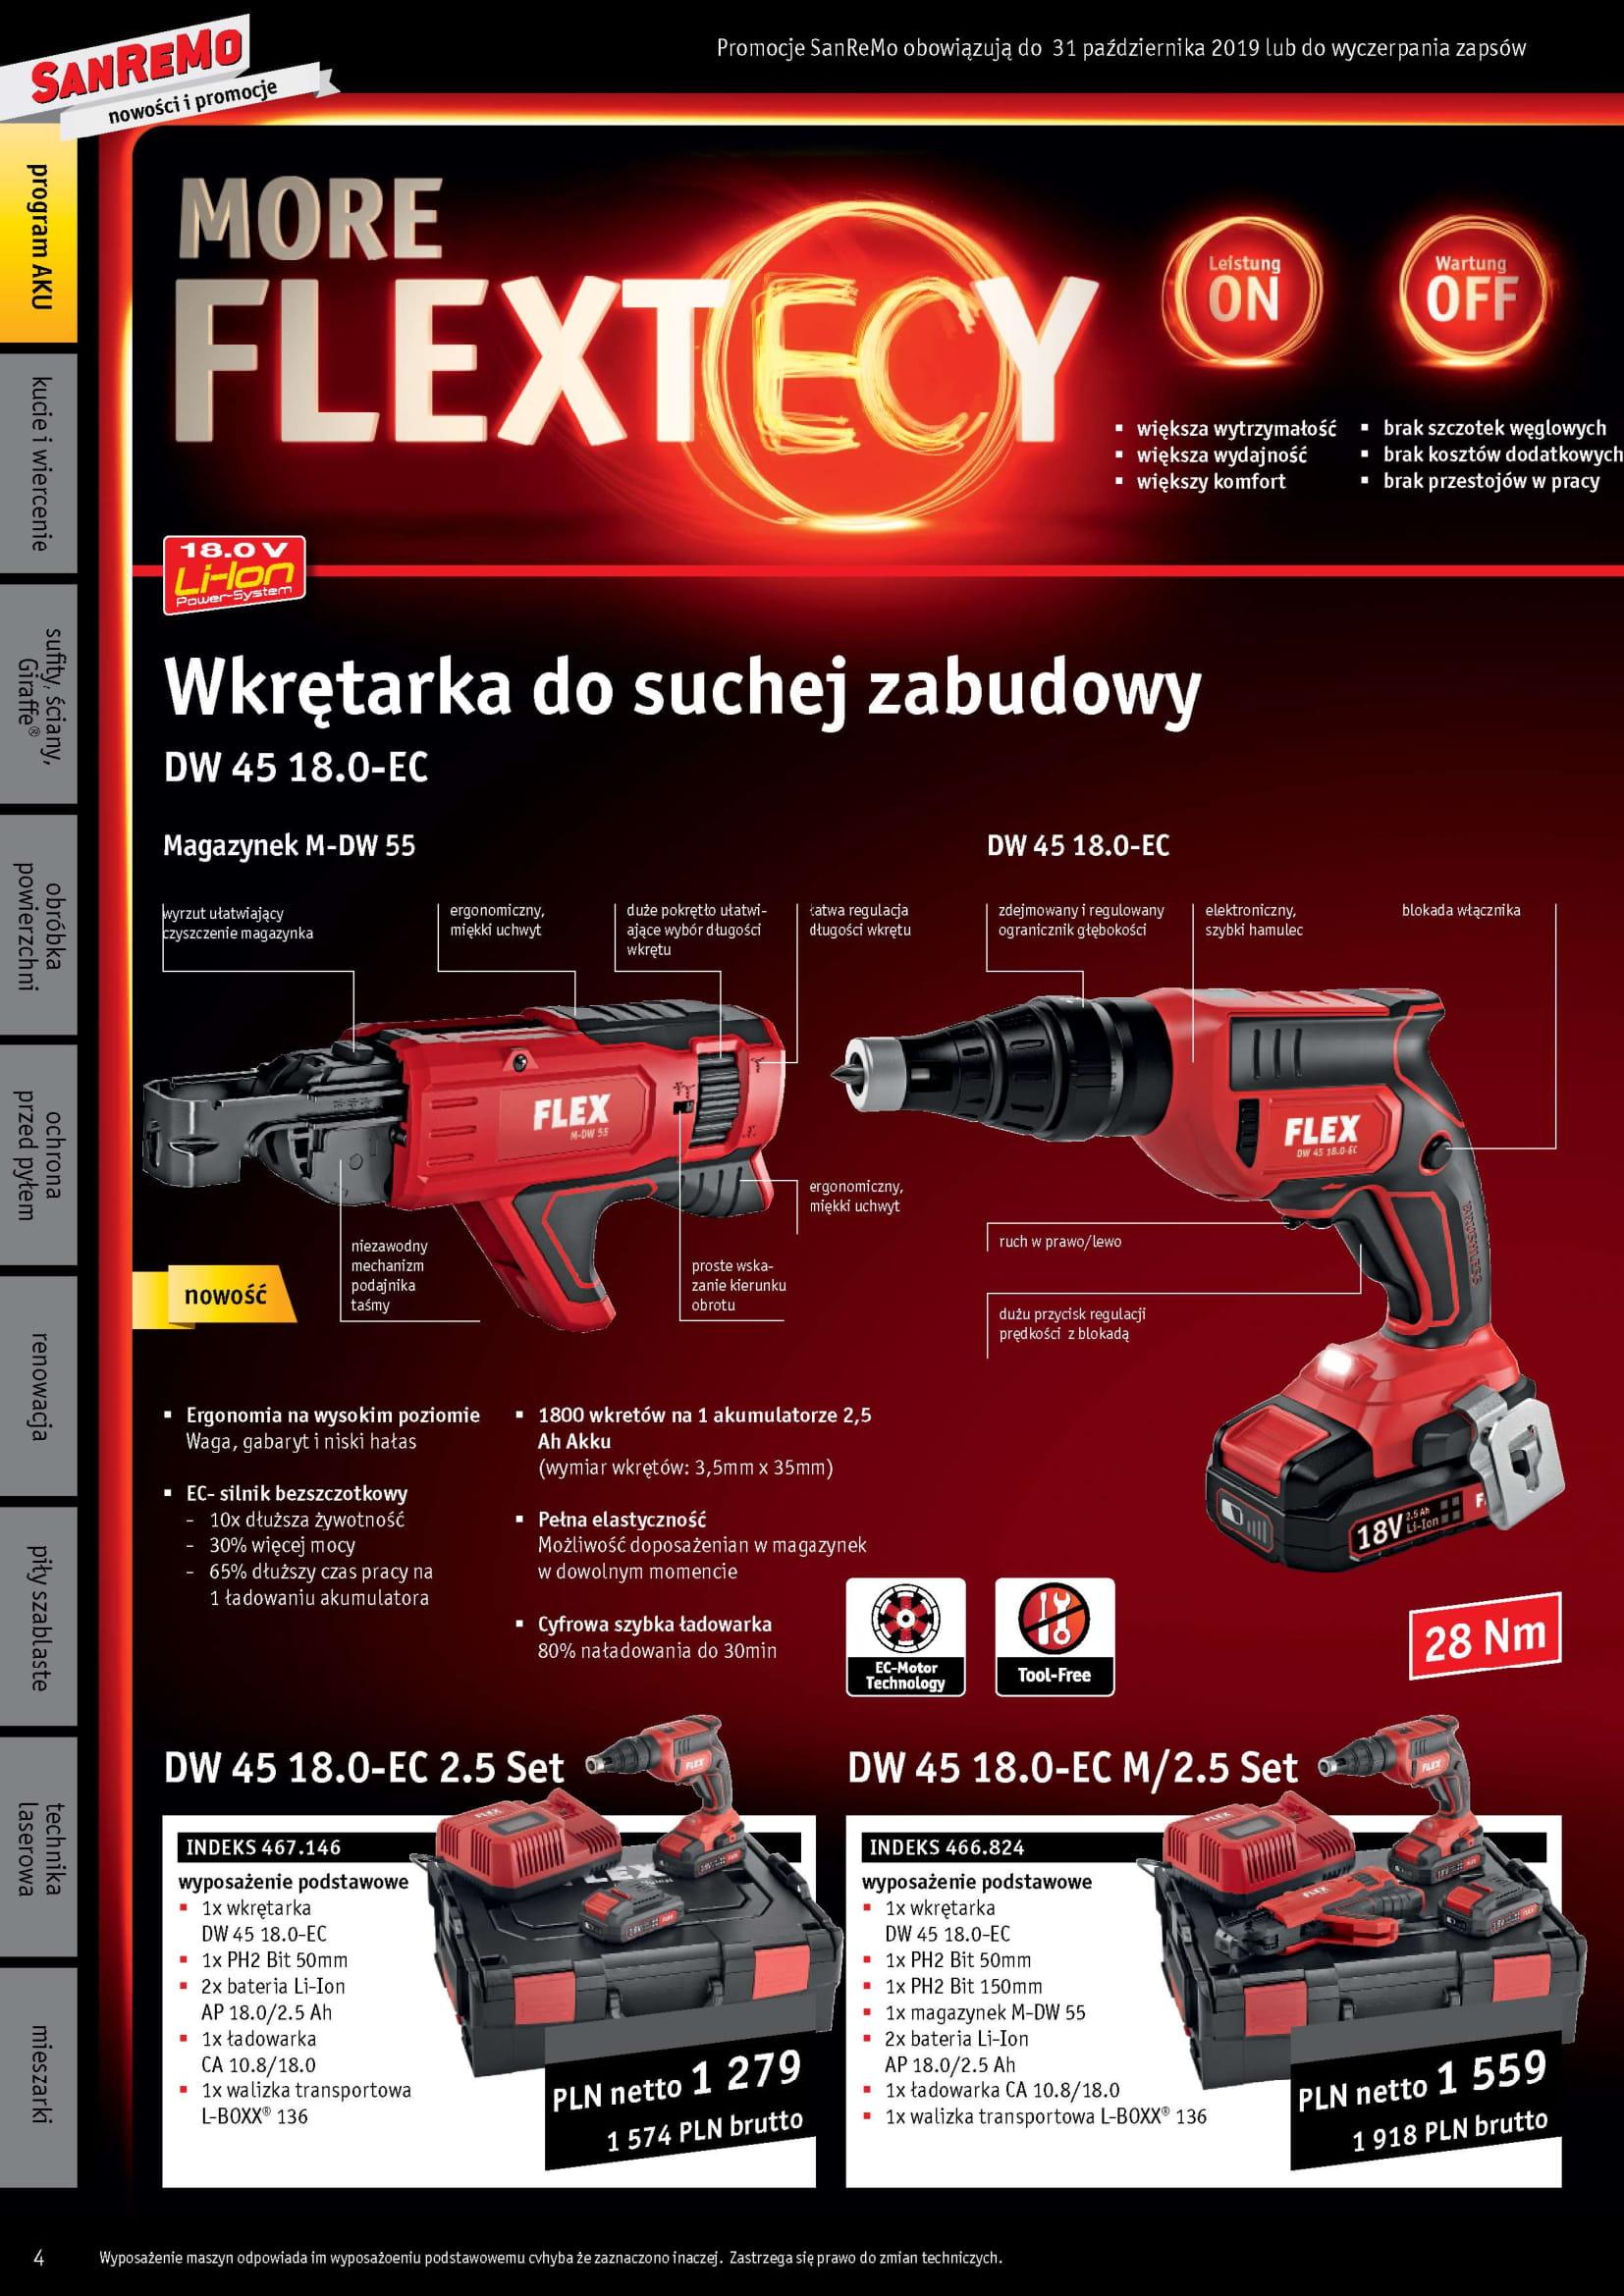 Promocja FLEX SanRemo III kw 2019